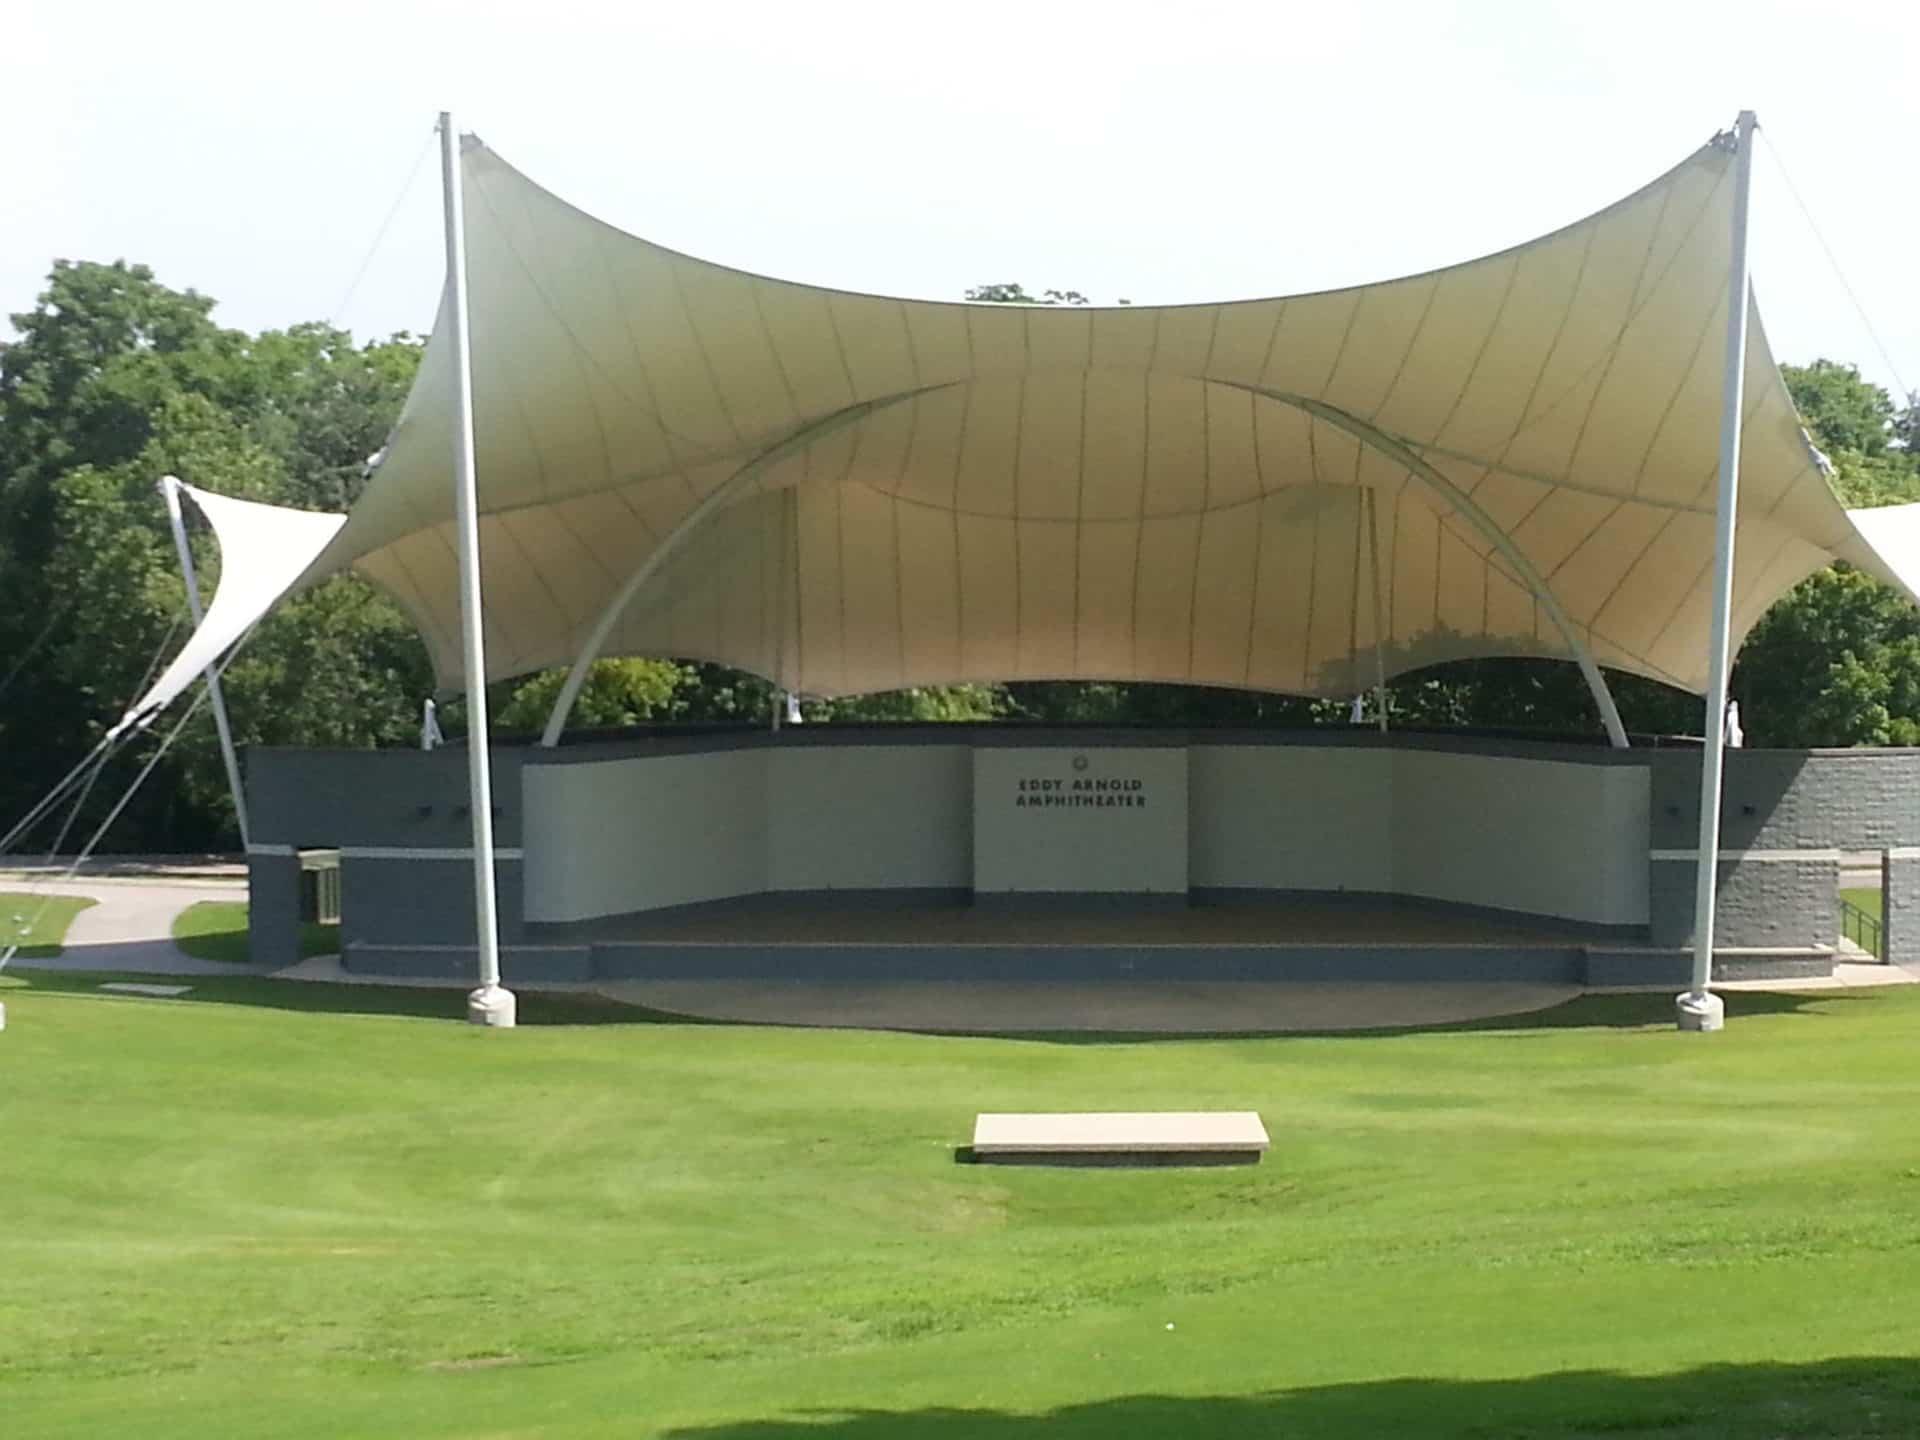 Crockett Park Eddy Arnold Ampitheater